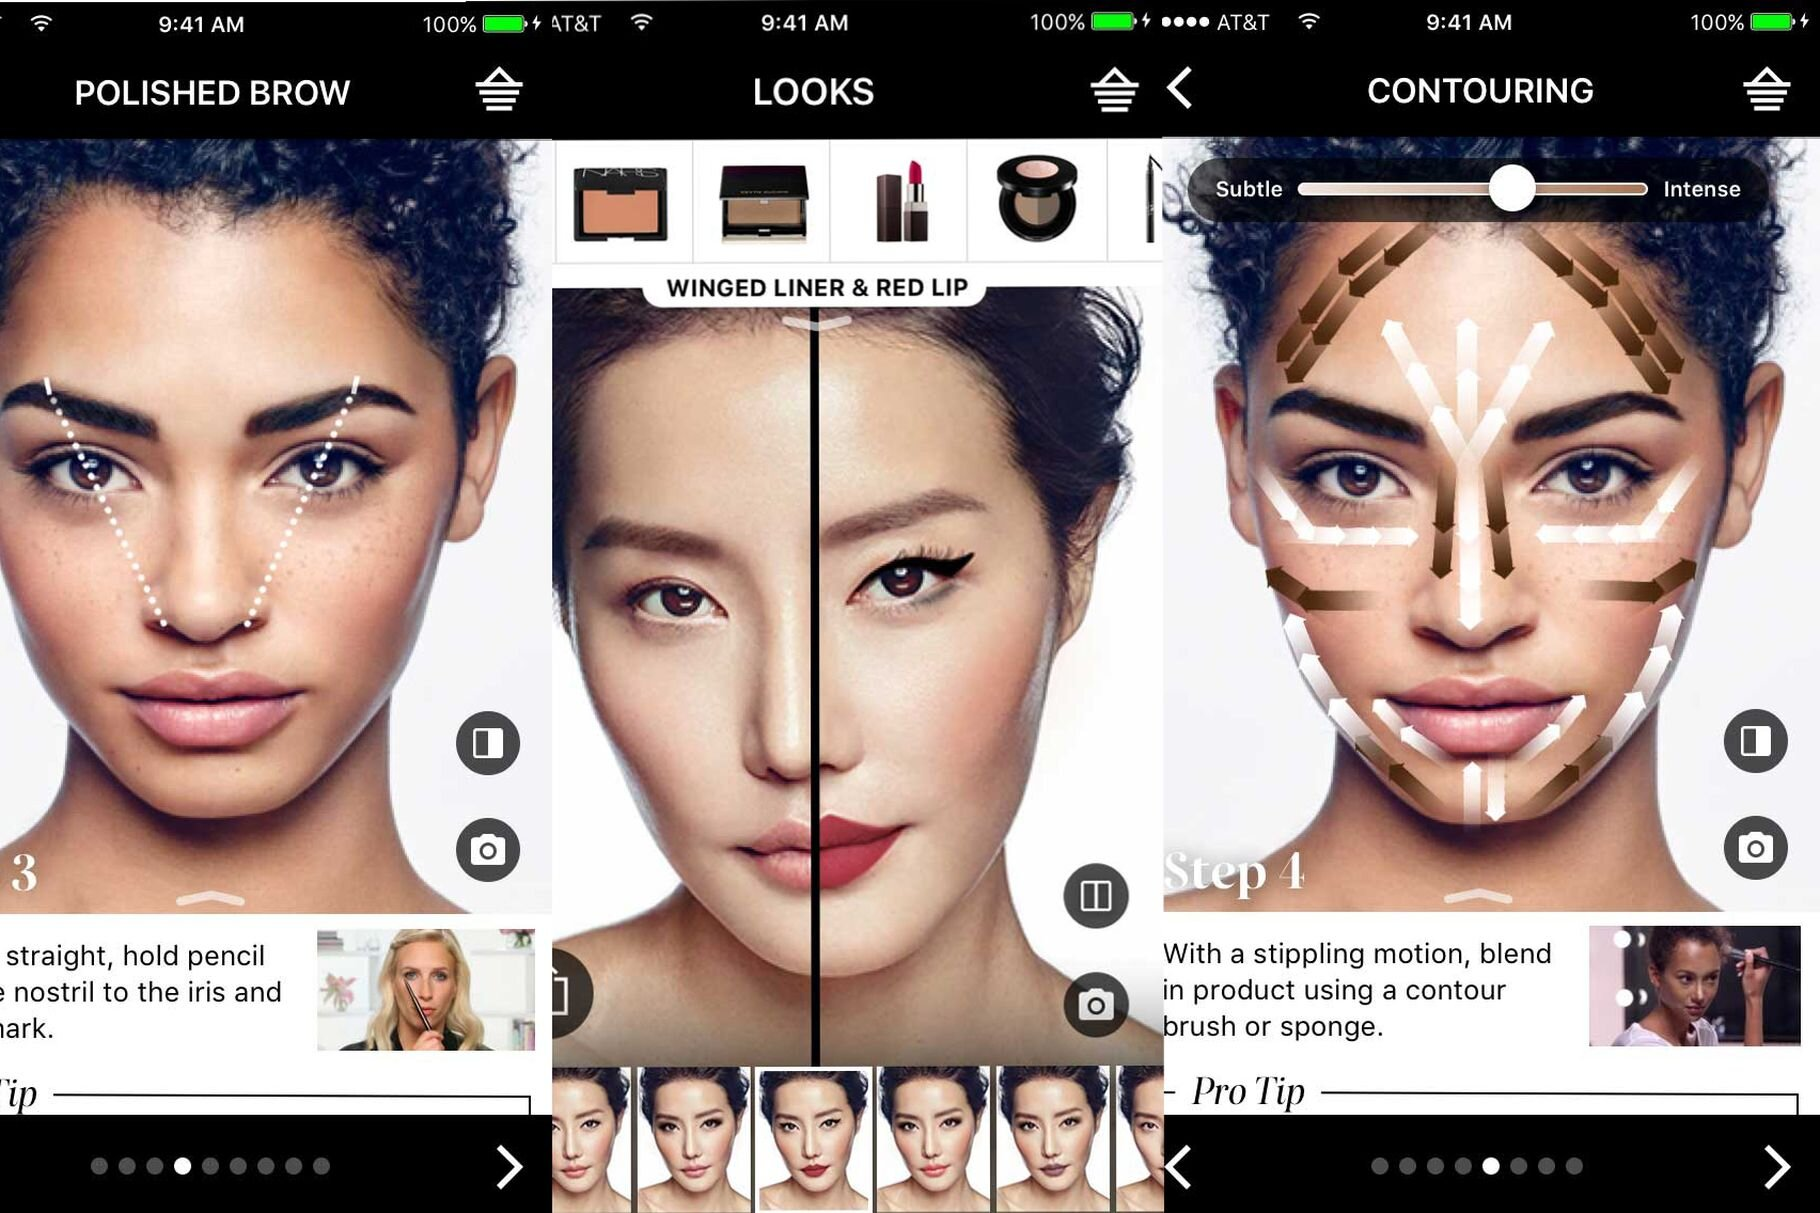 Sephora's Virtual Assistant App